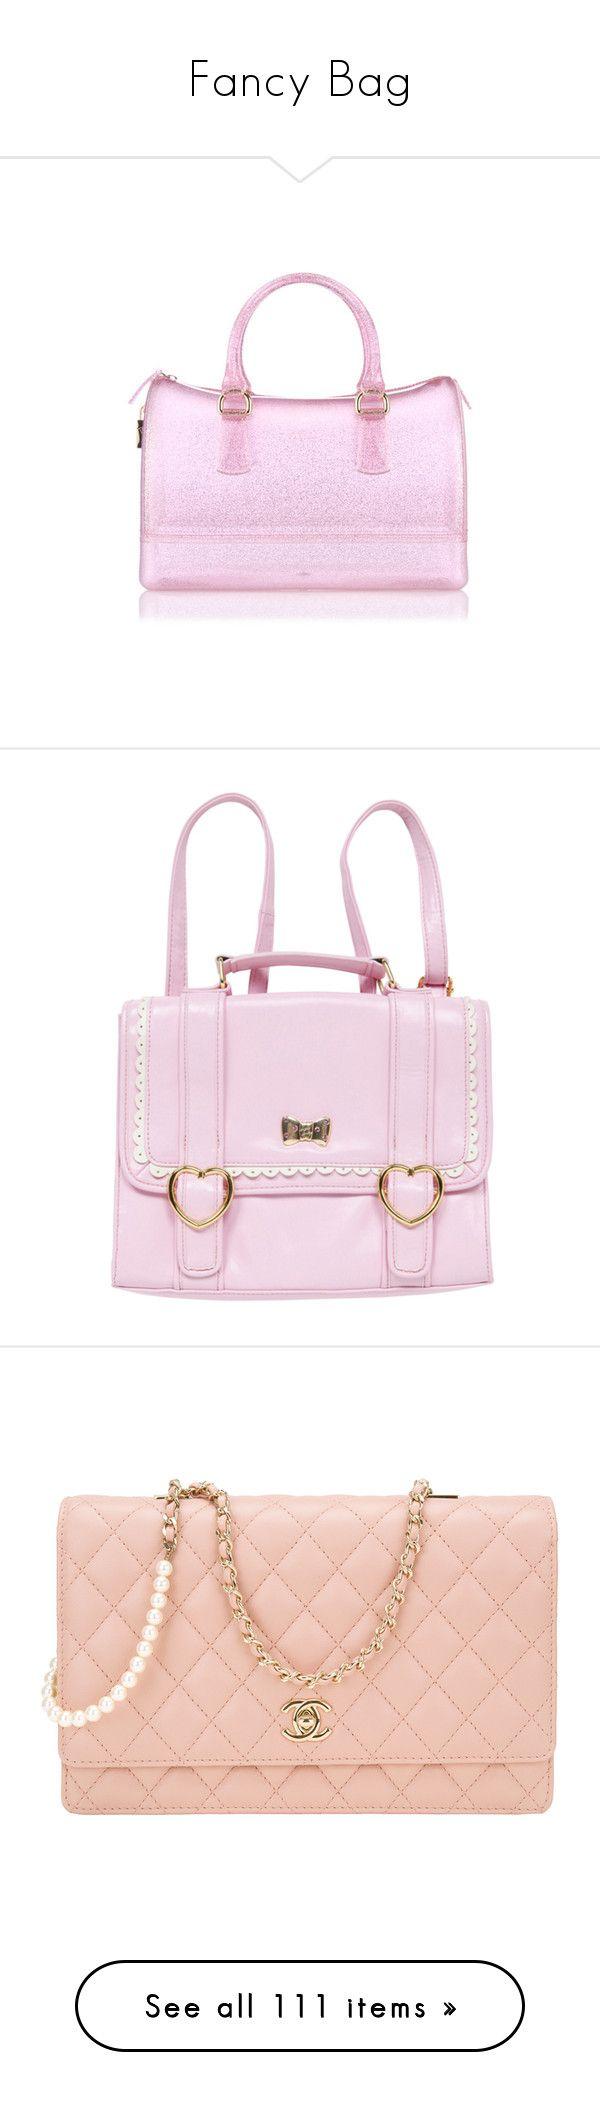 """Fancy Bag"" by faanciella ❤ liked on Polyvore featuring bags, handbags, furla bags, pvc handbags, pink handbags, furla, furla purses, accessories, backpacks and pink"